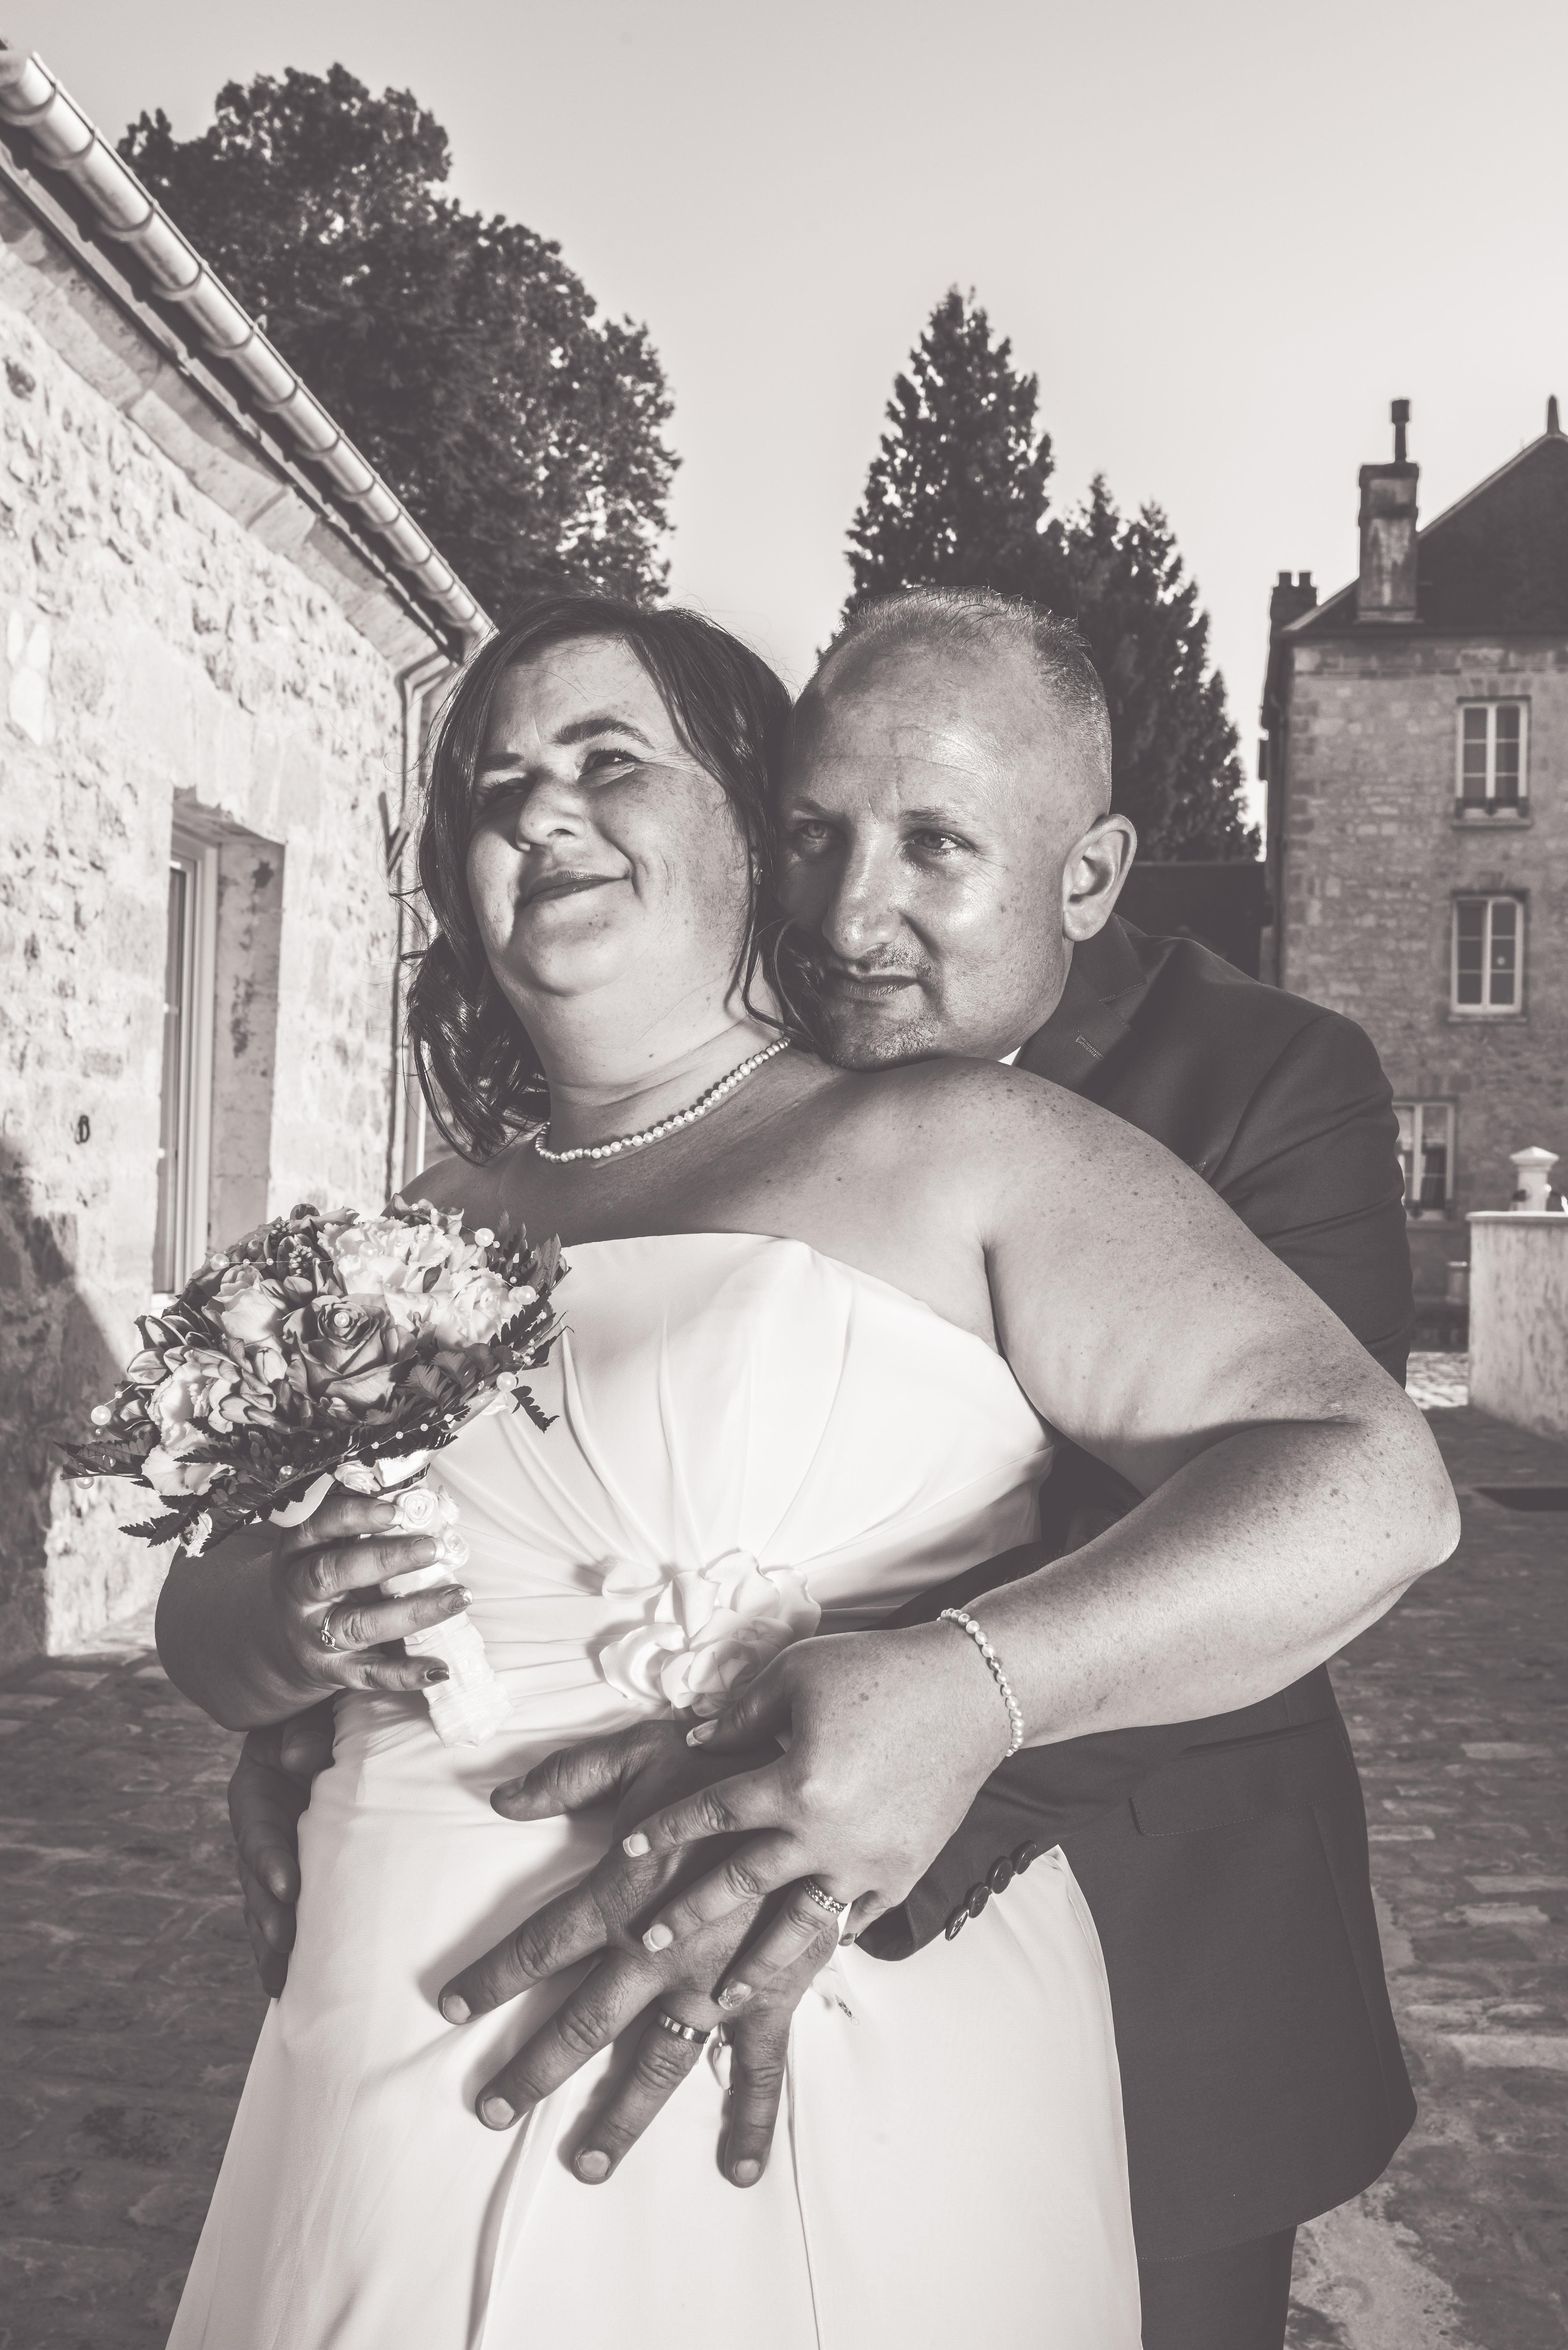 Mariage_Aurélie_&_Geoffrey_-_Couple-11.